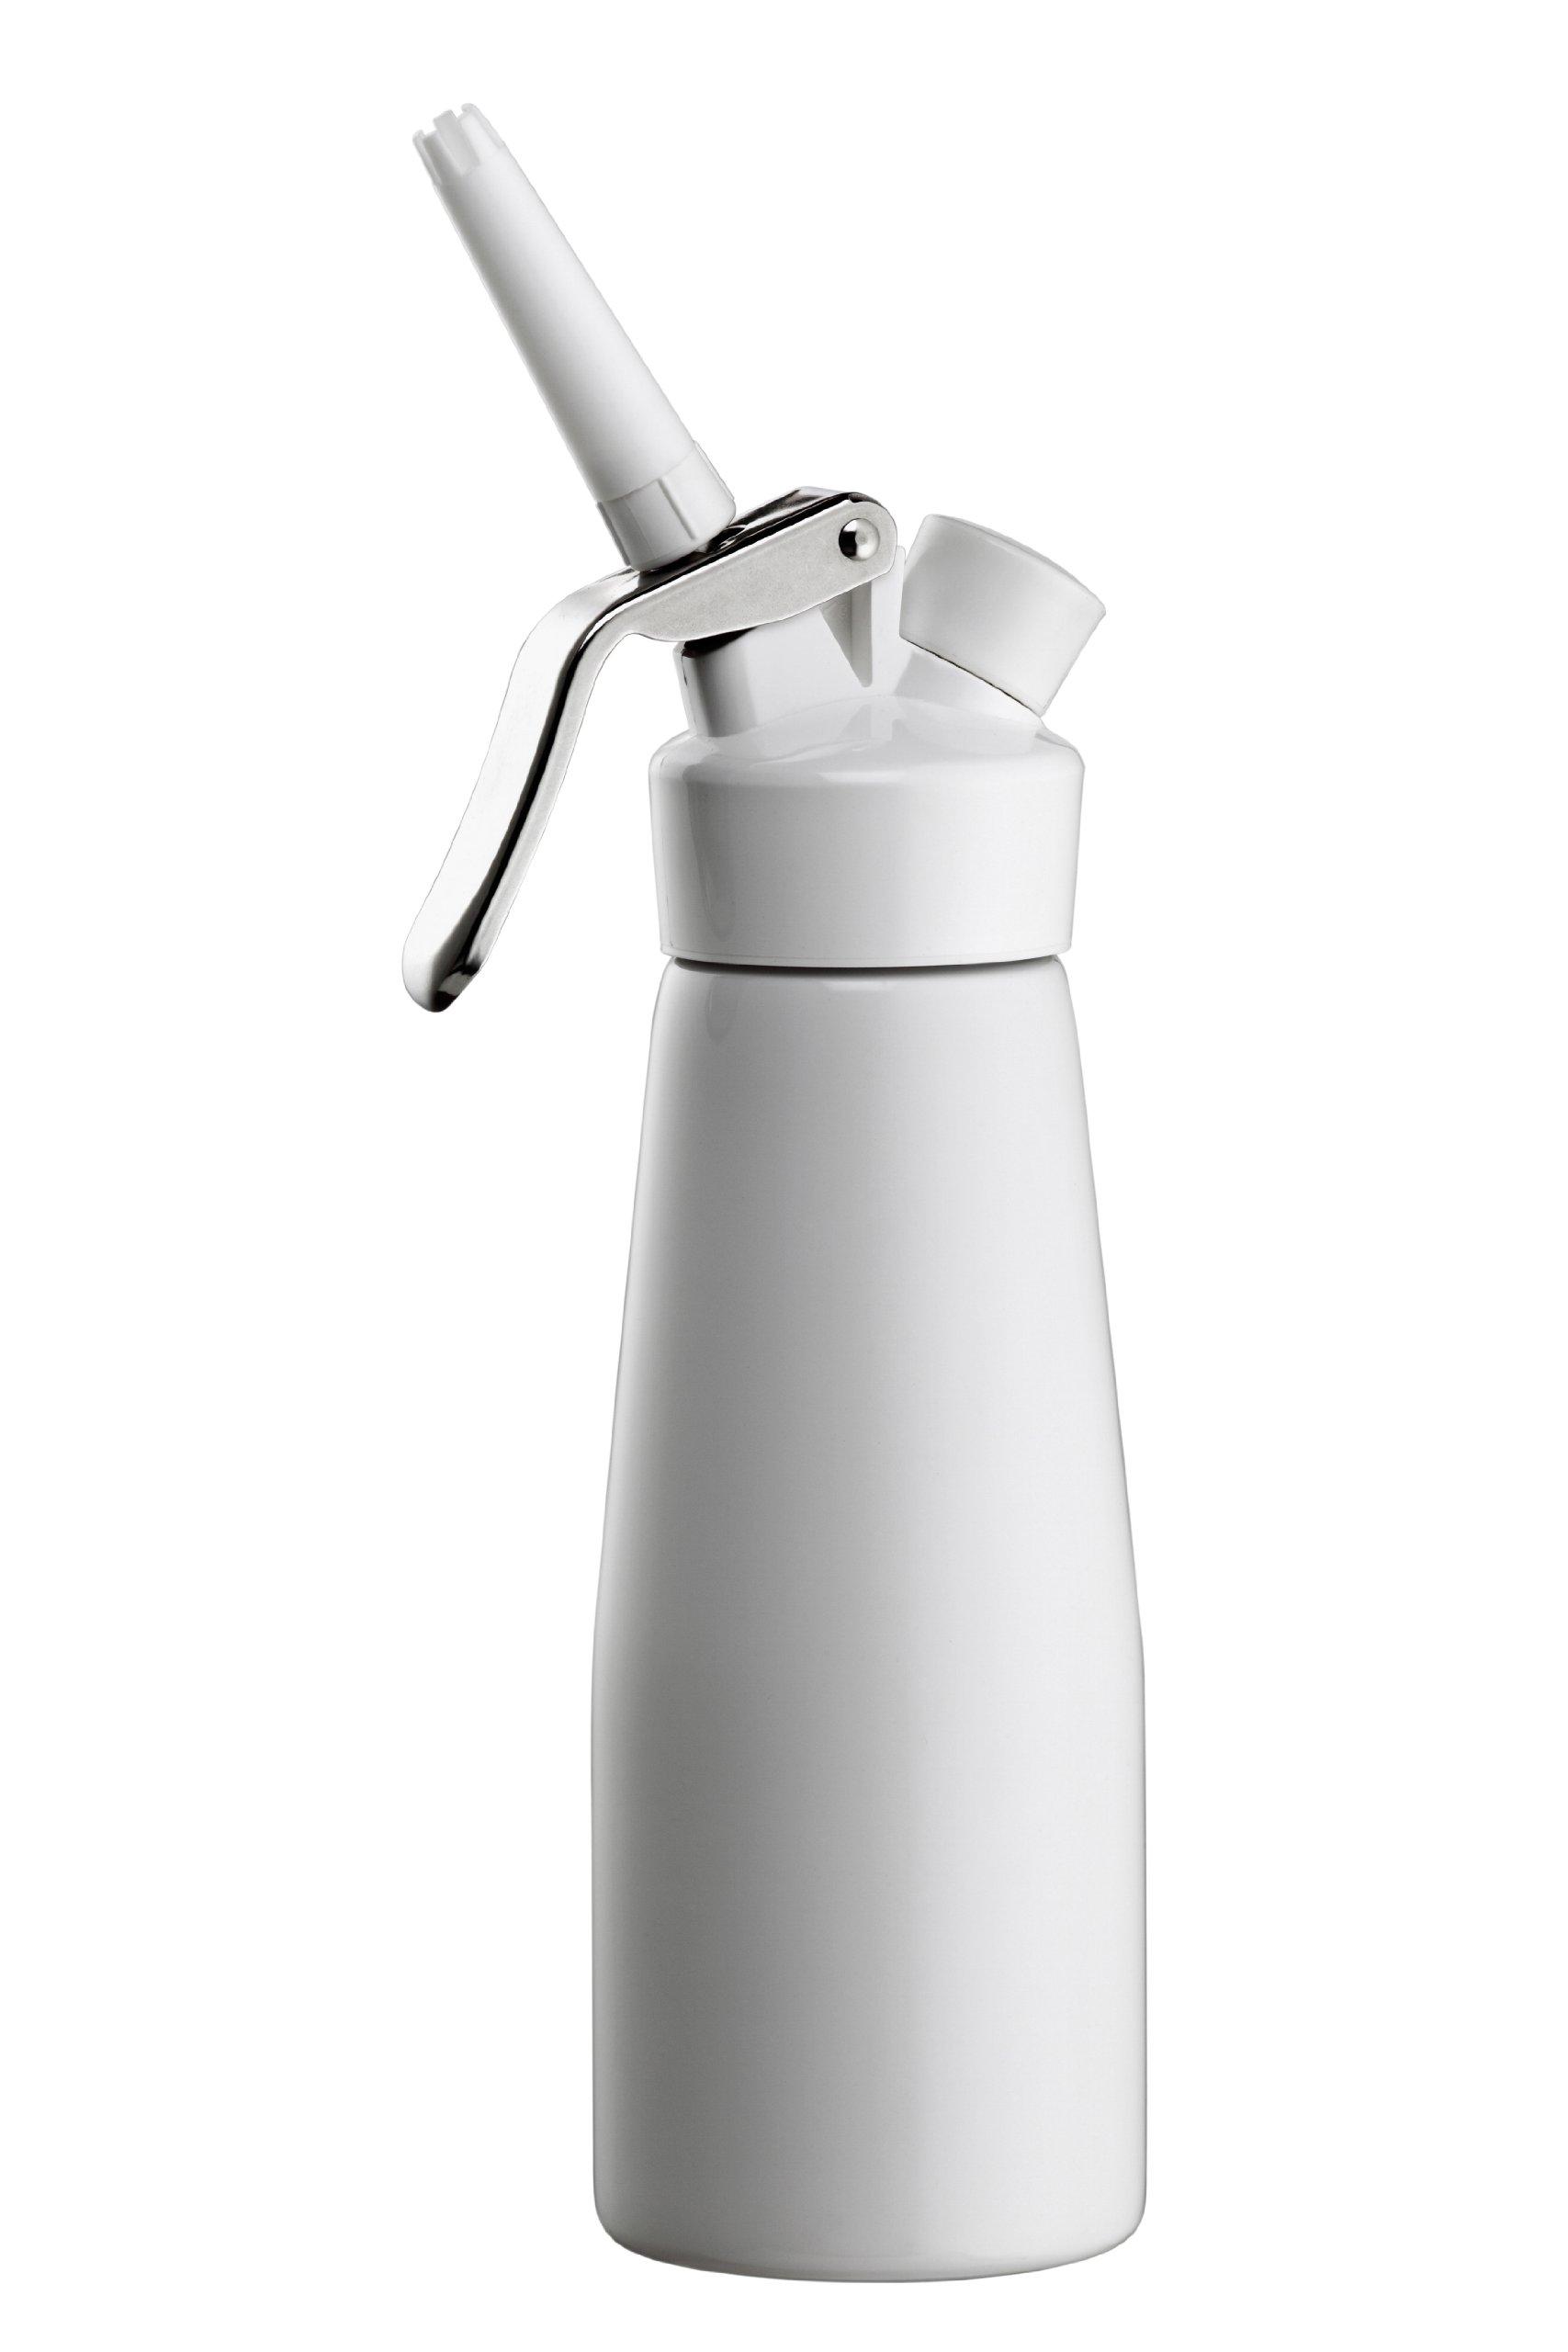 Chef Master Deluxe Whipped Cream Dispenser  image